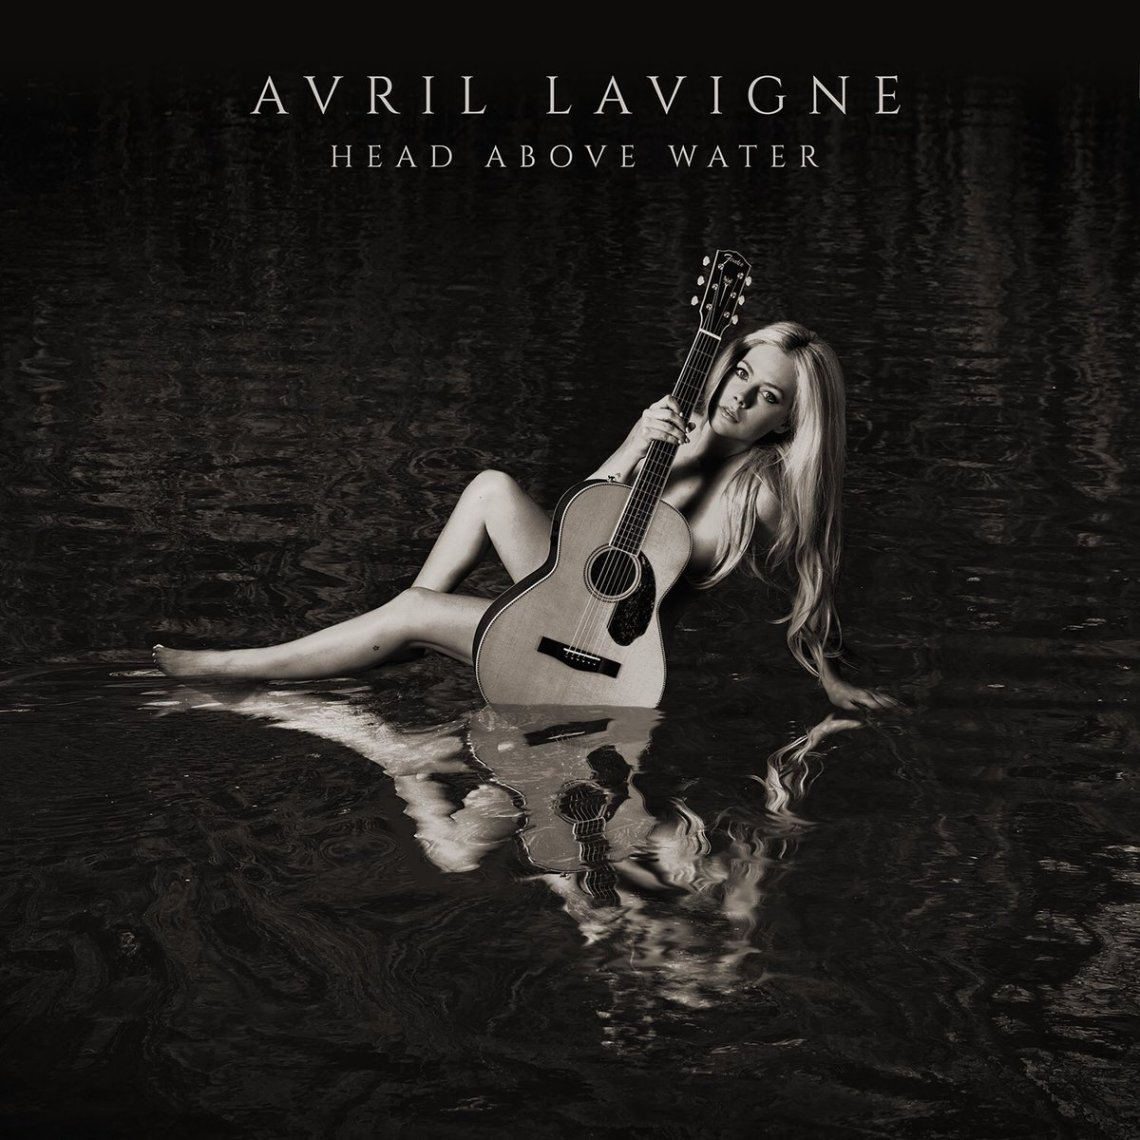 Avril Lavigne, Head Above Water (Album Lyrics)